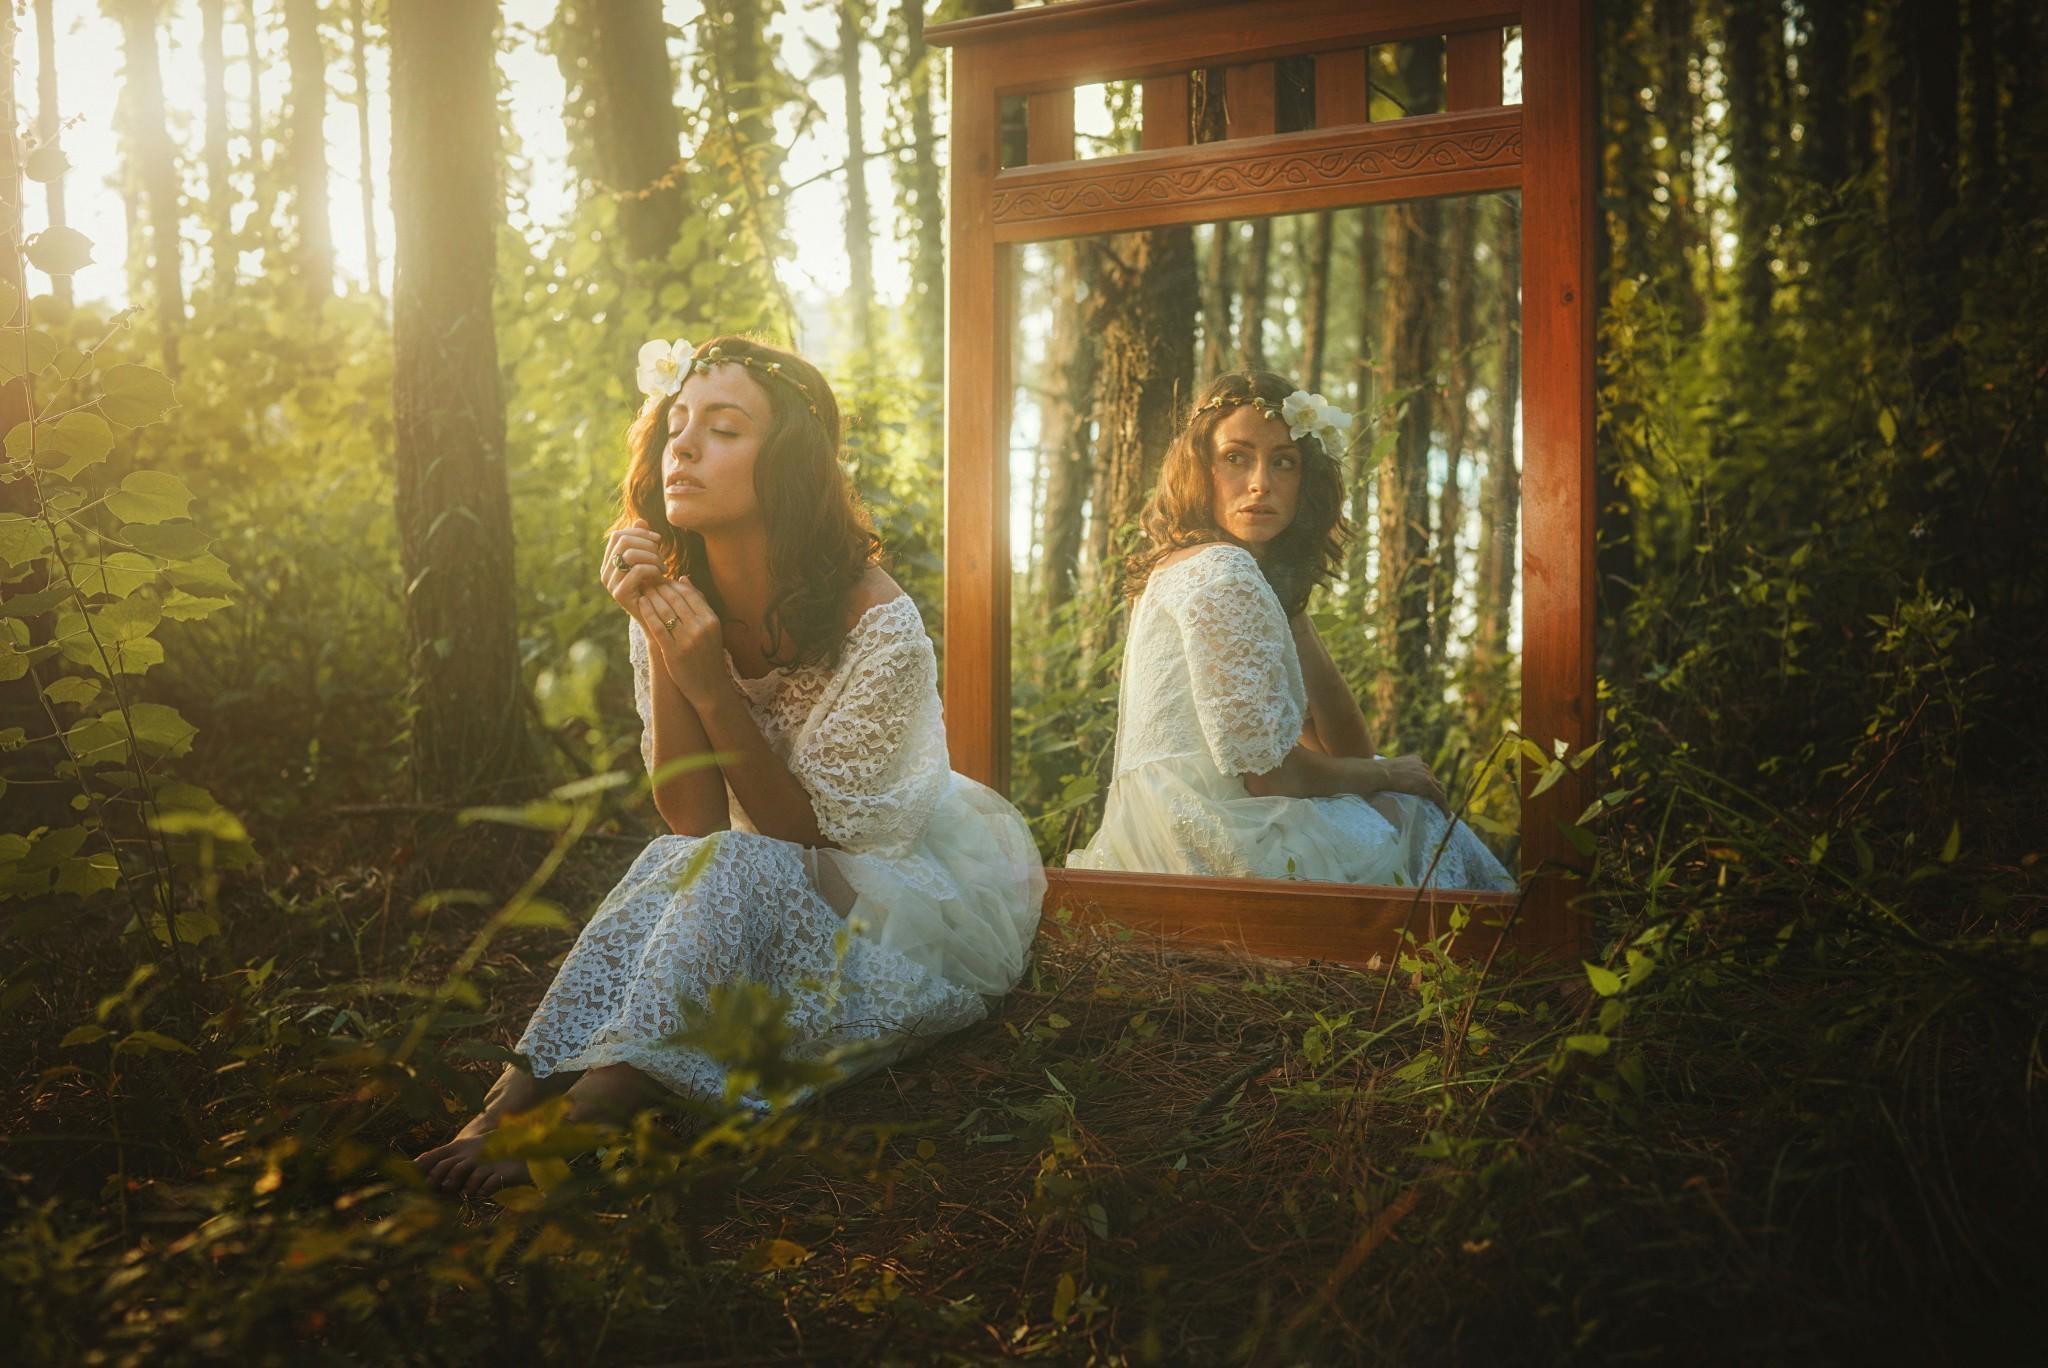 Sunlight Forest Women Mirror Autumn Flower Season Photograph Woodland 2048x1368 Px